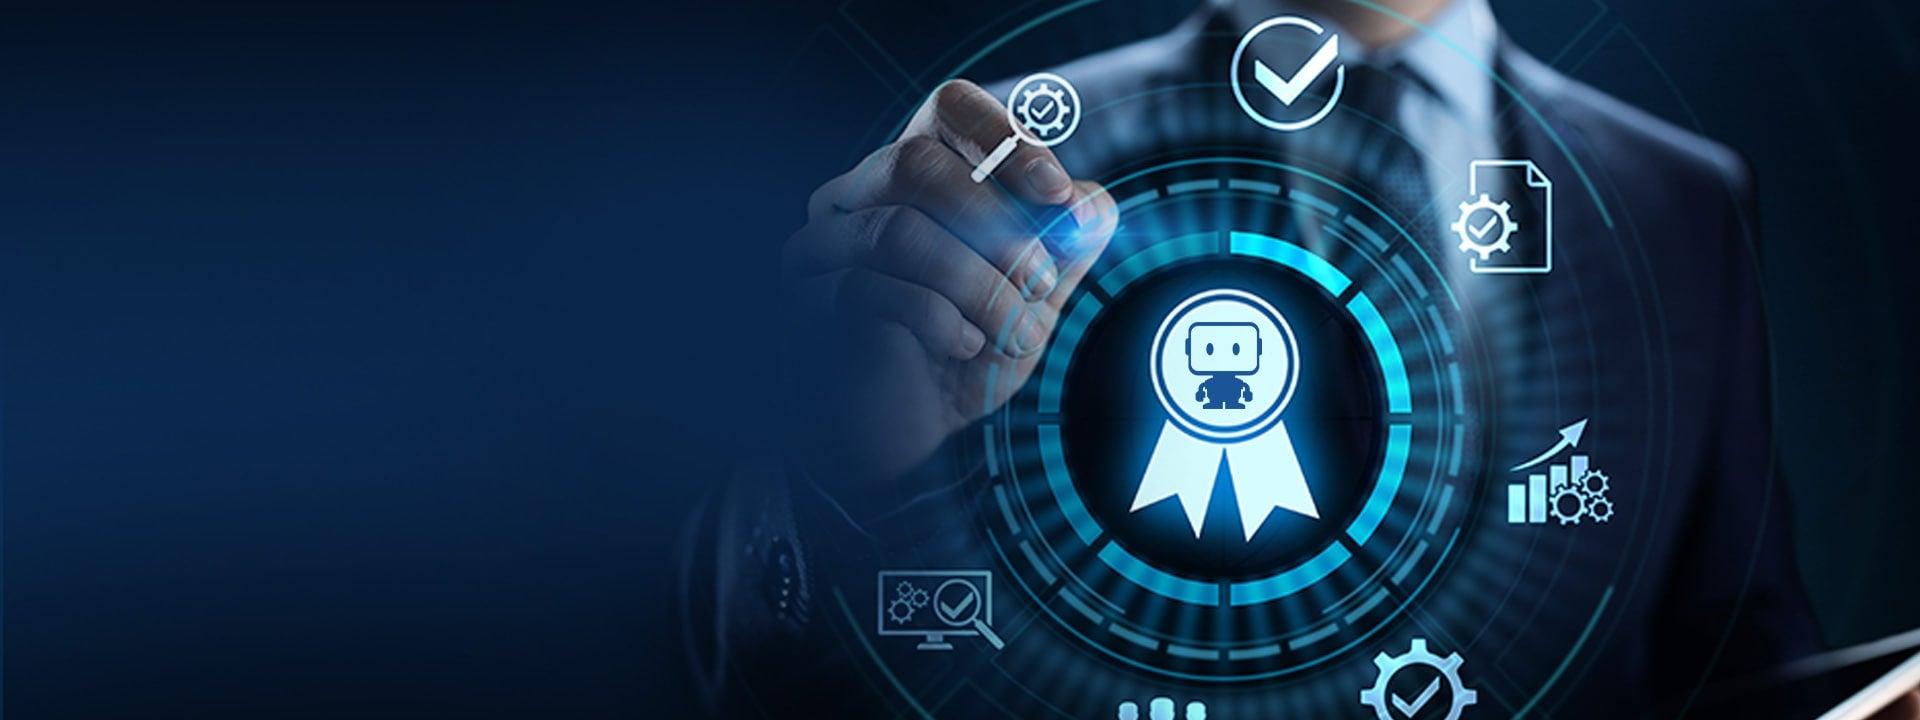 Certify Your Skills a a Citizen Data Scientist BKG